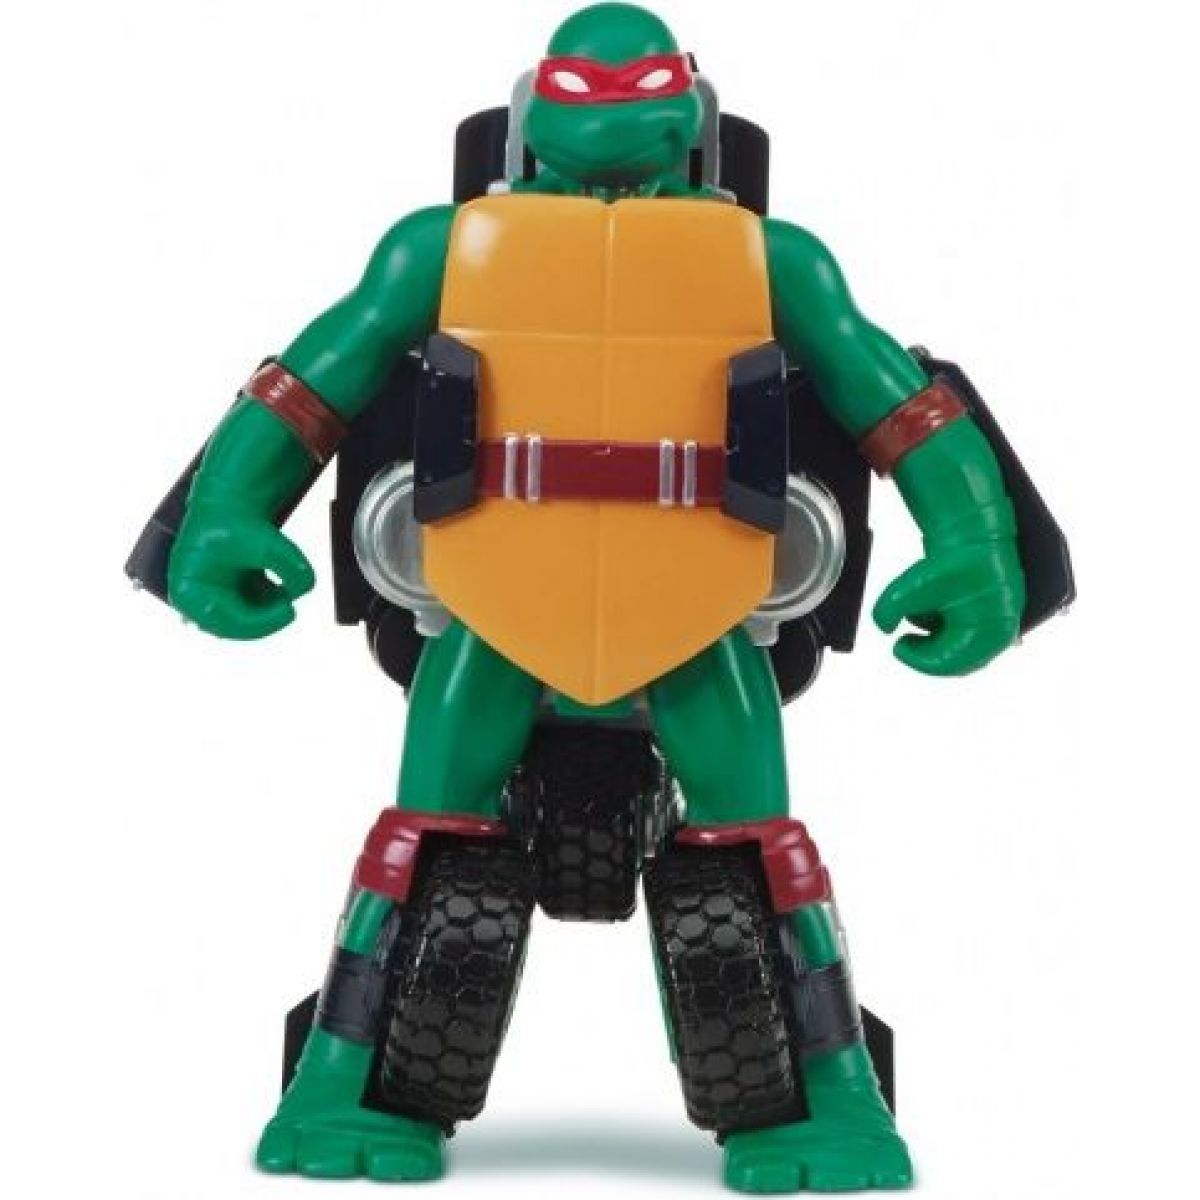 Playmates TMNT Želvy Ninja Transform to vehicle Raphael